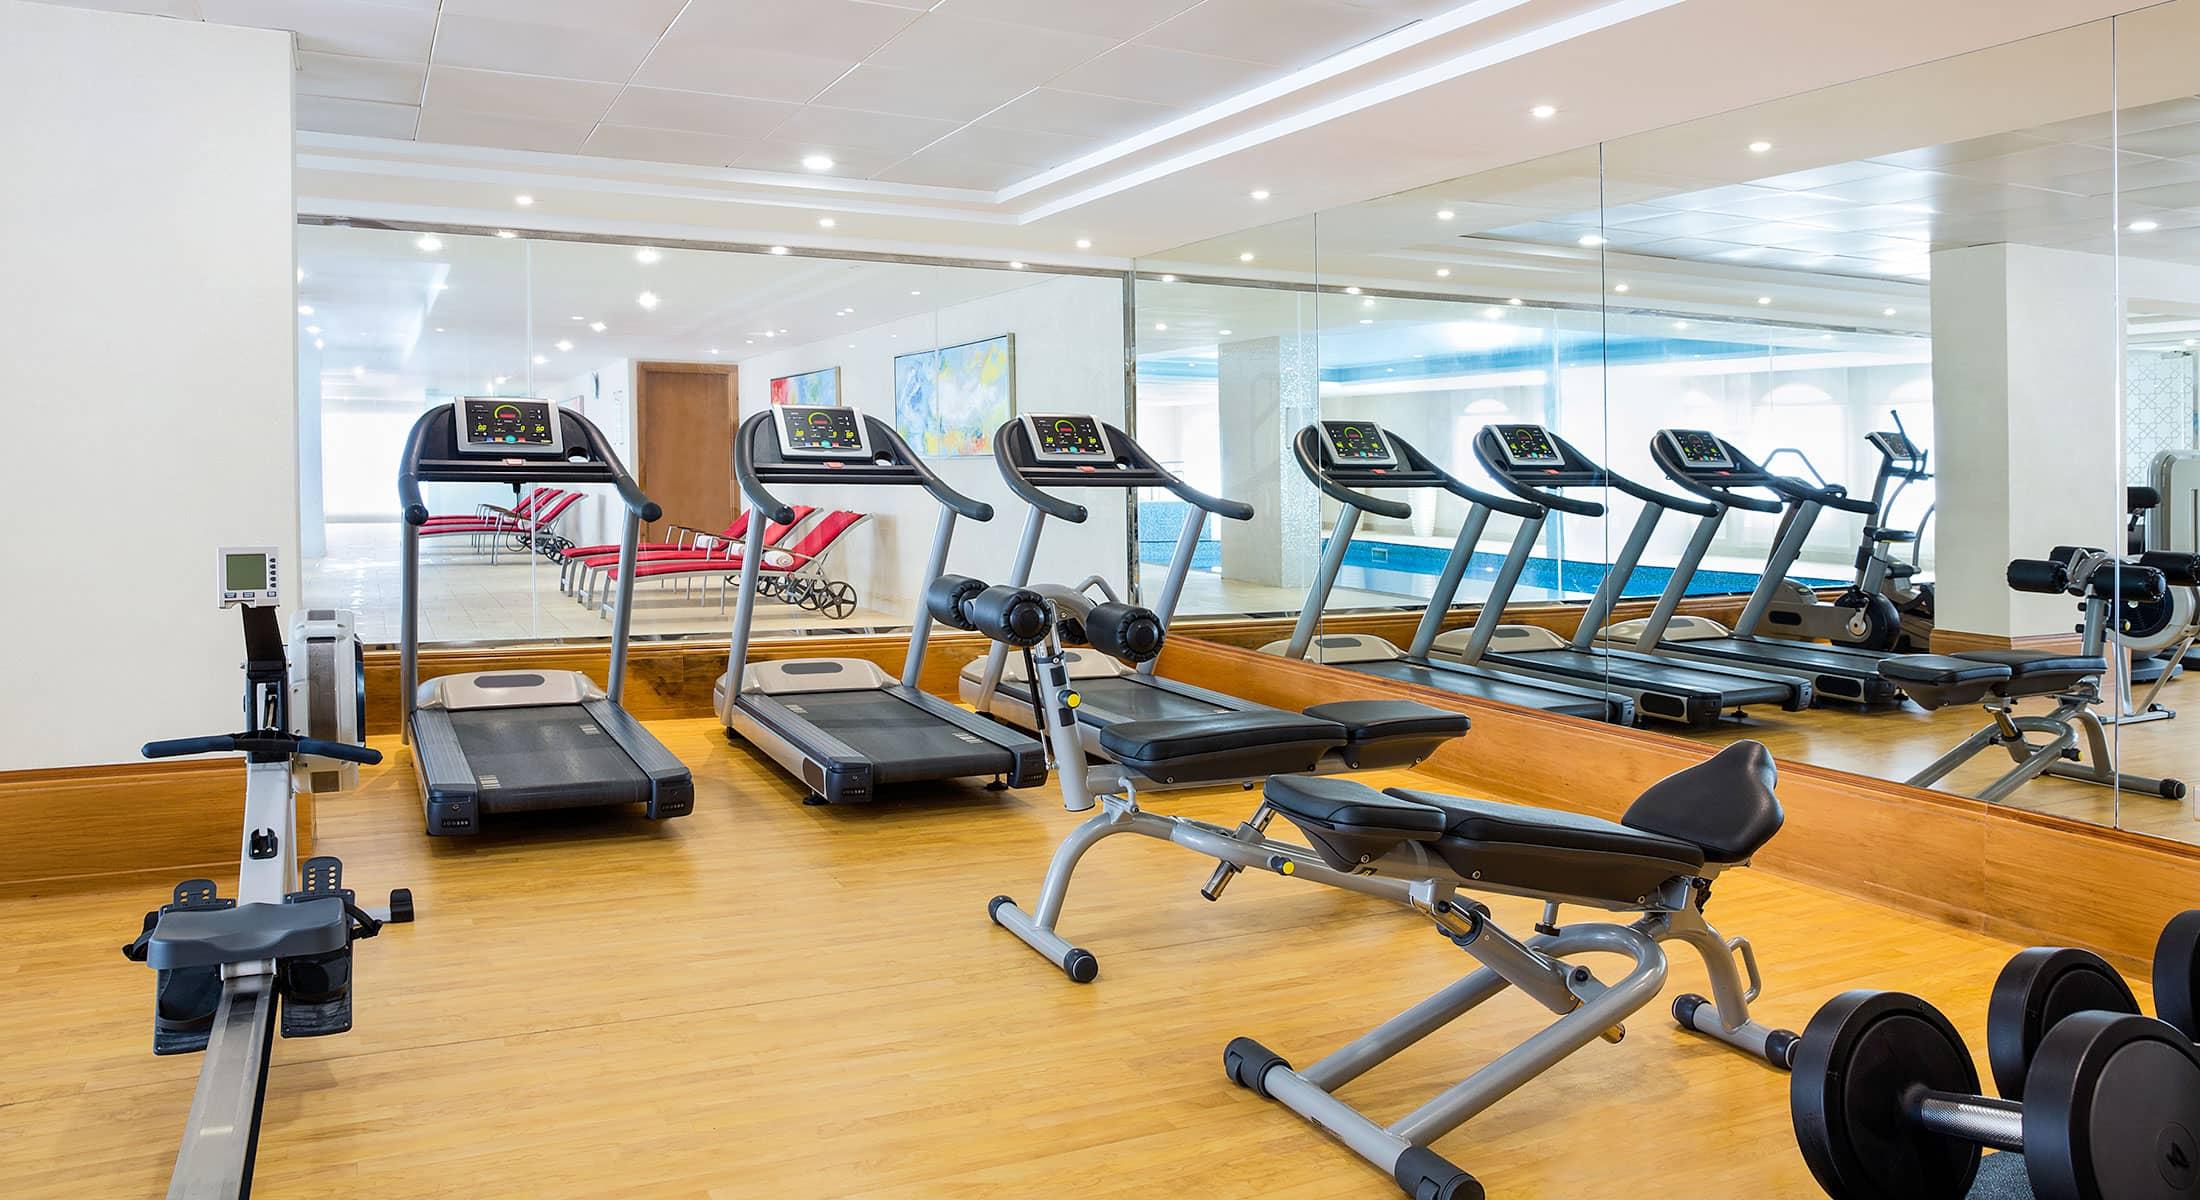 gym-indoor-pool